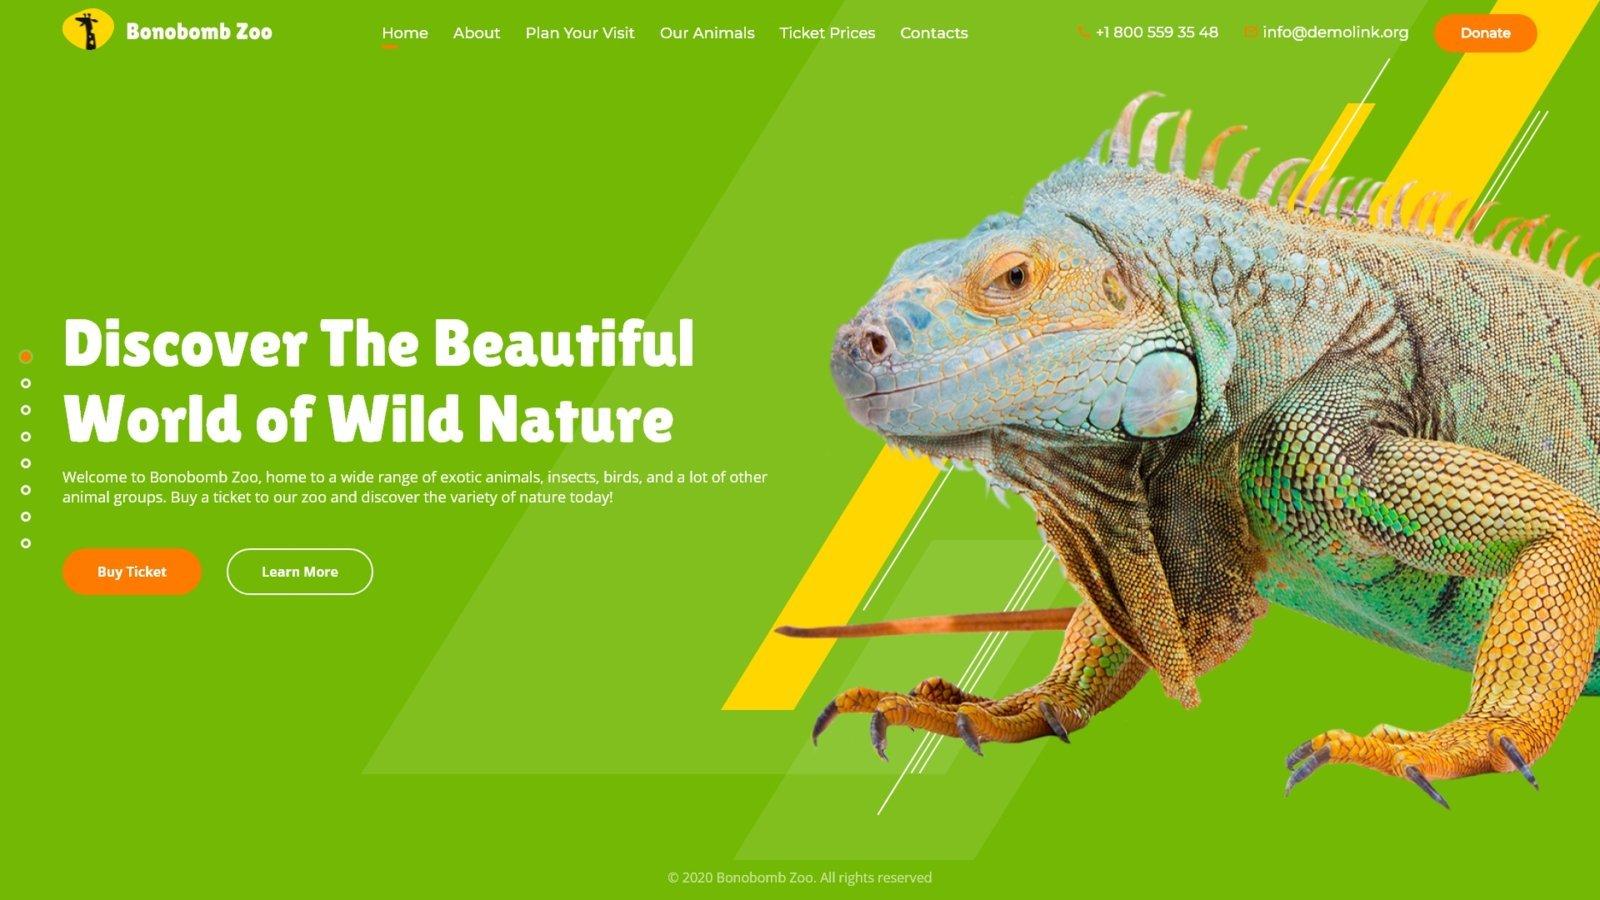 Bonobomb - Full Animated Zoo Website Template